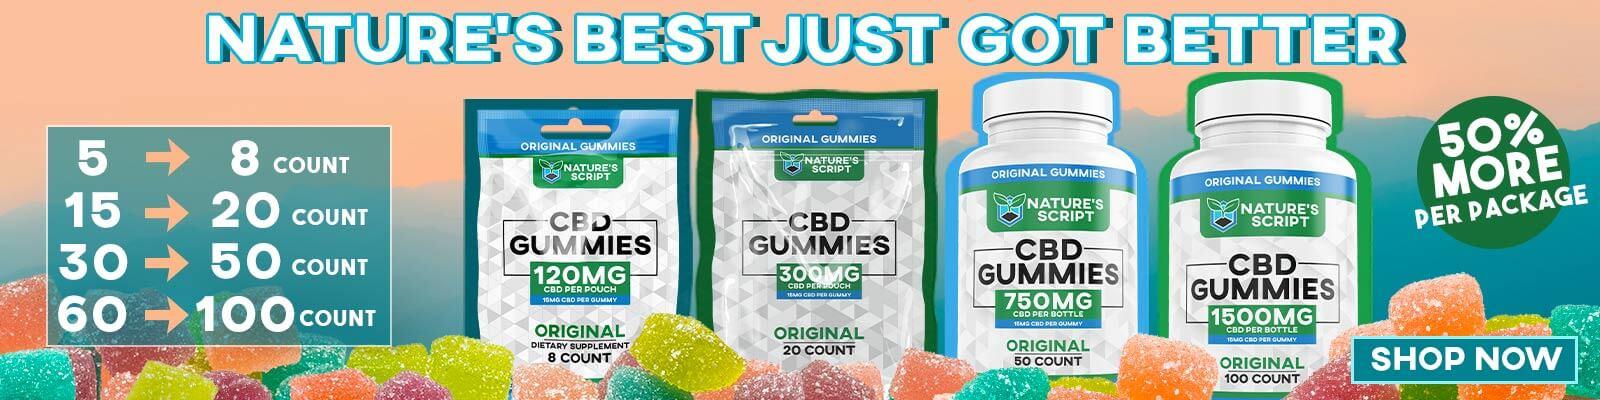 Nature's Script CBD Gummies Homepage Banner